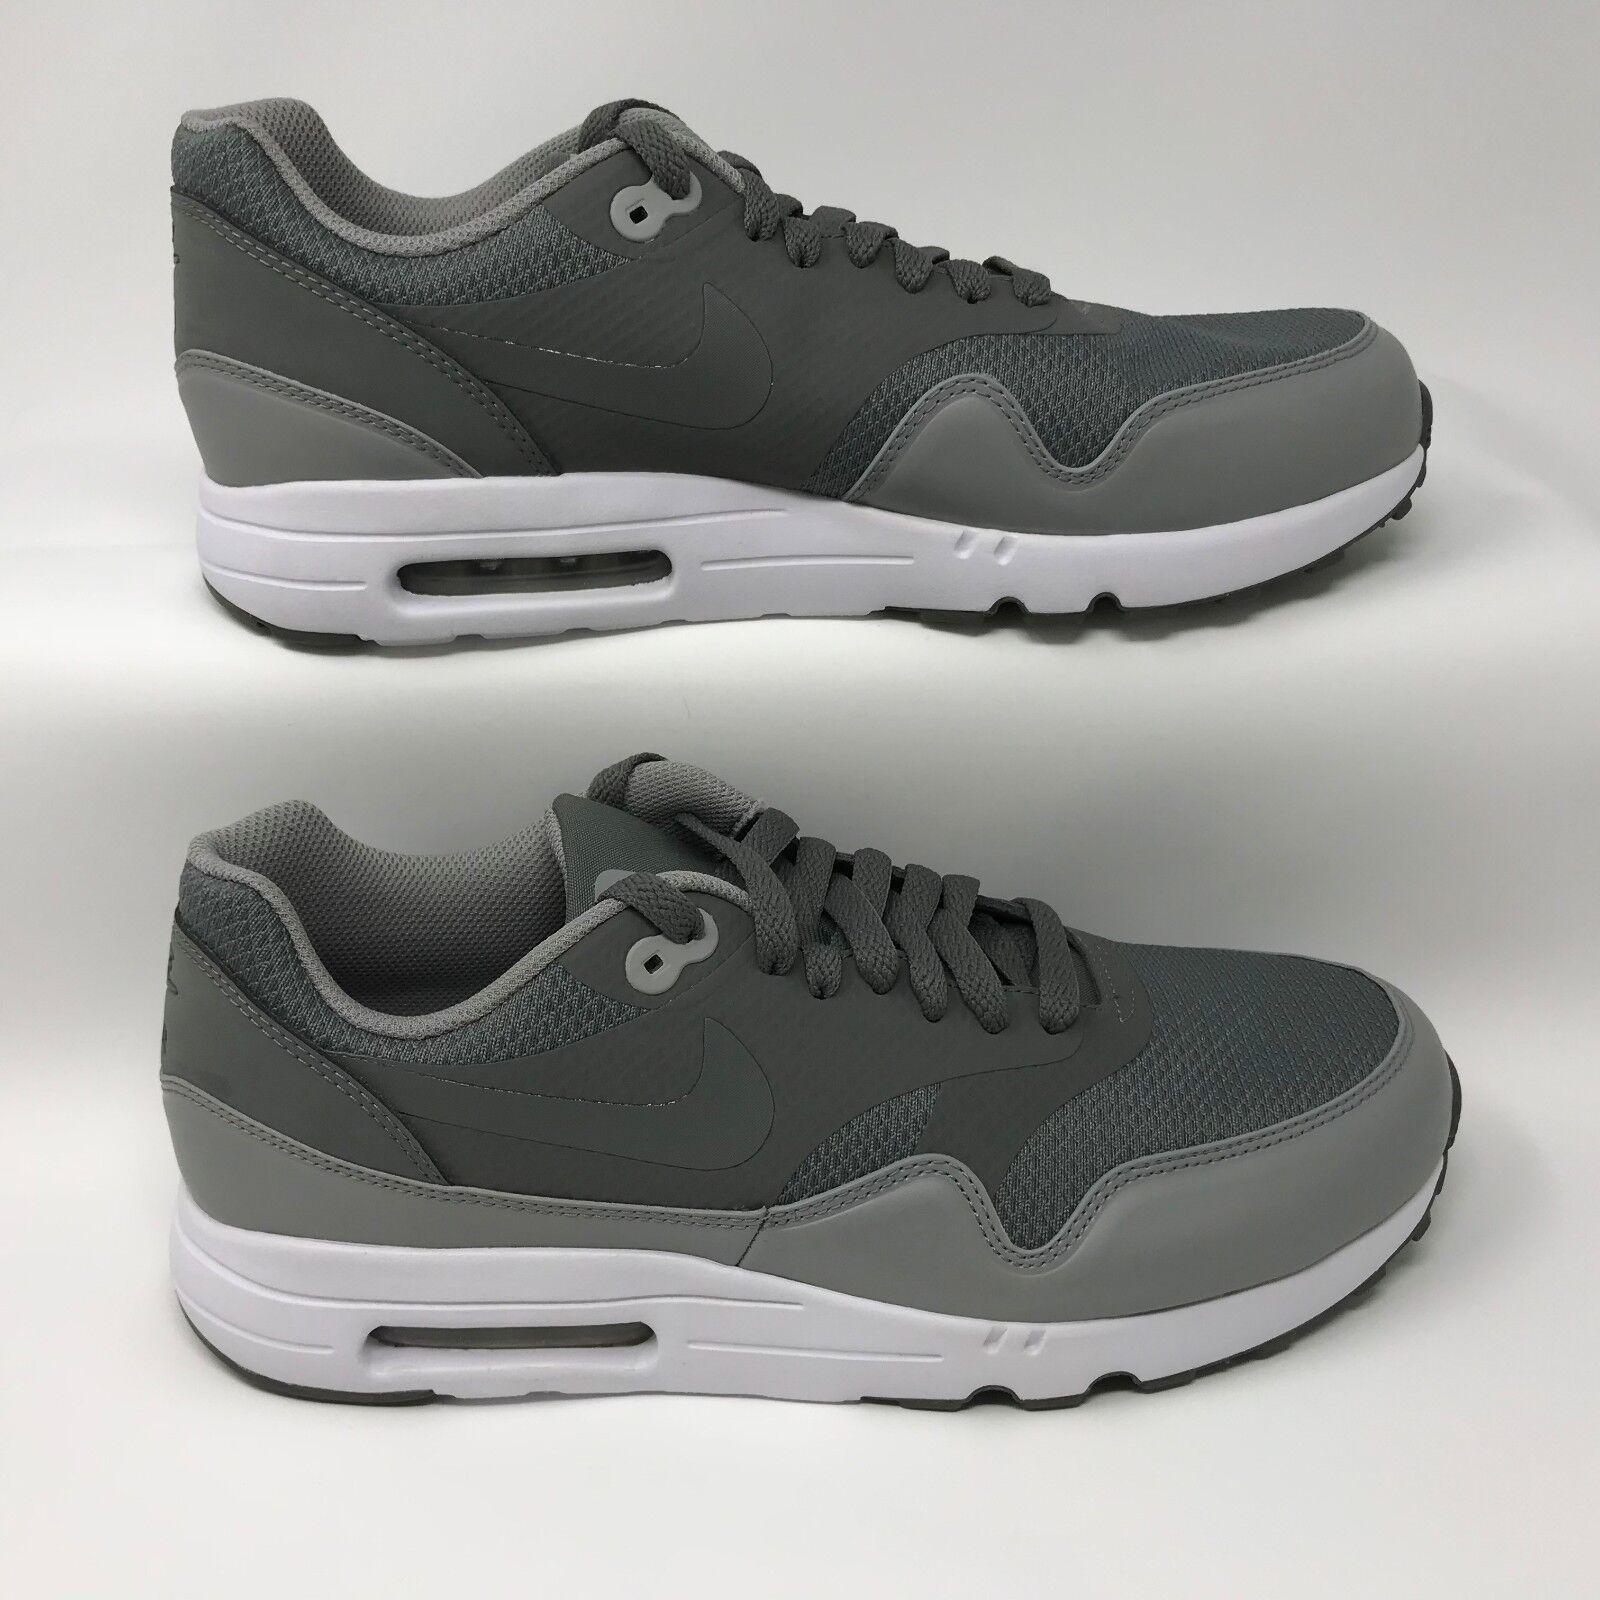 76a14638395f Nike 875679-003 Men s Men s Men s Air Max 1 Ultra 2.0 Essential Grey Size 9  ddb4b8